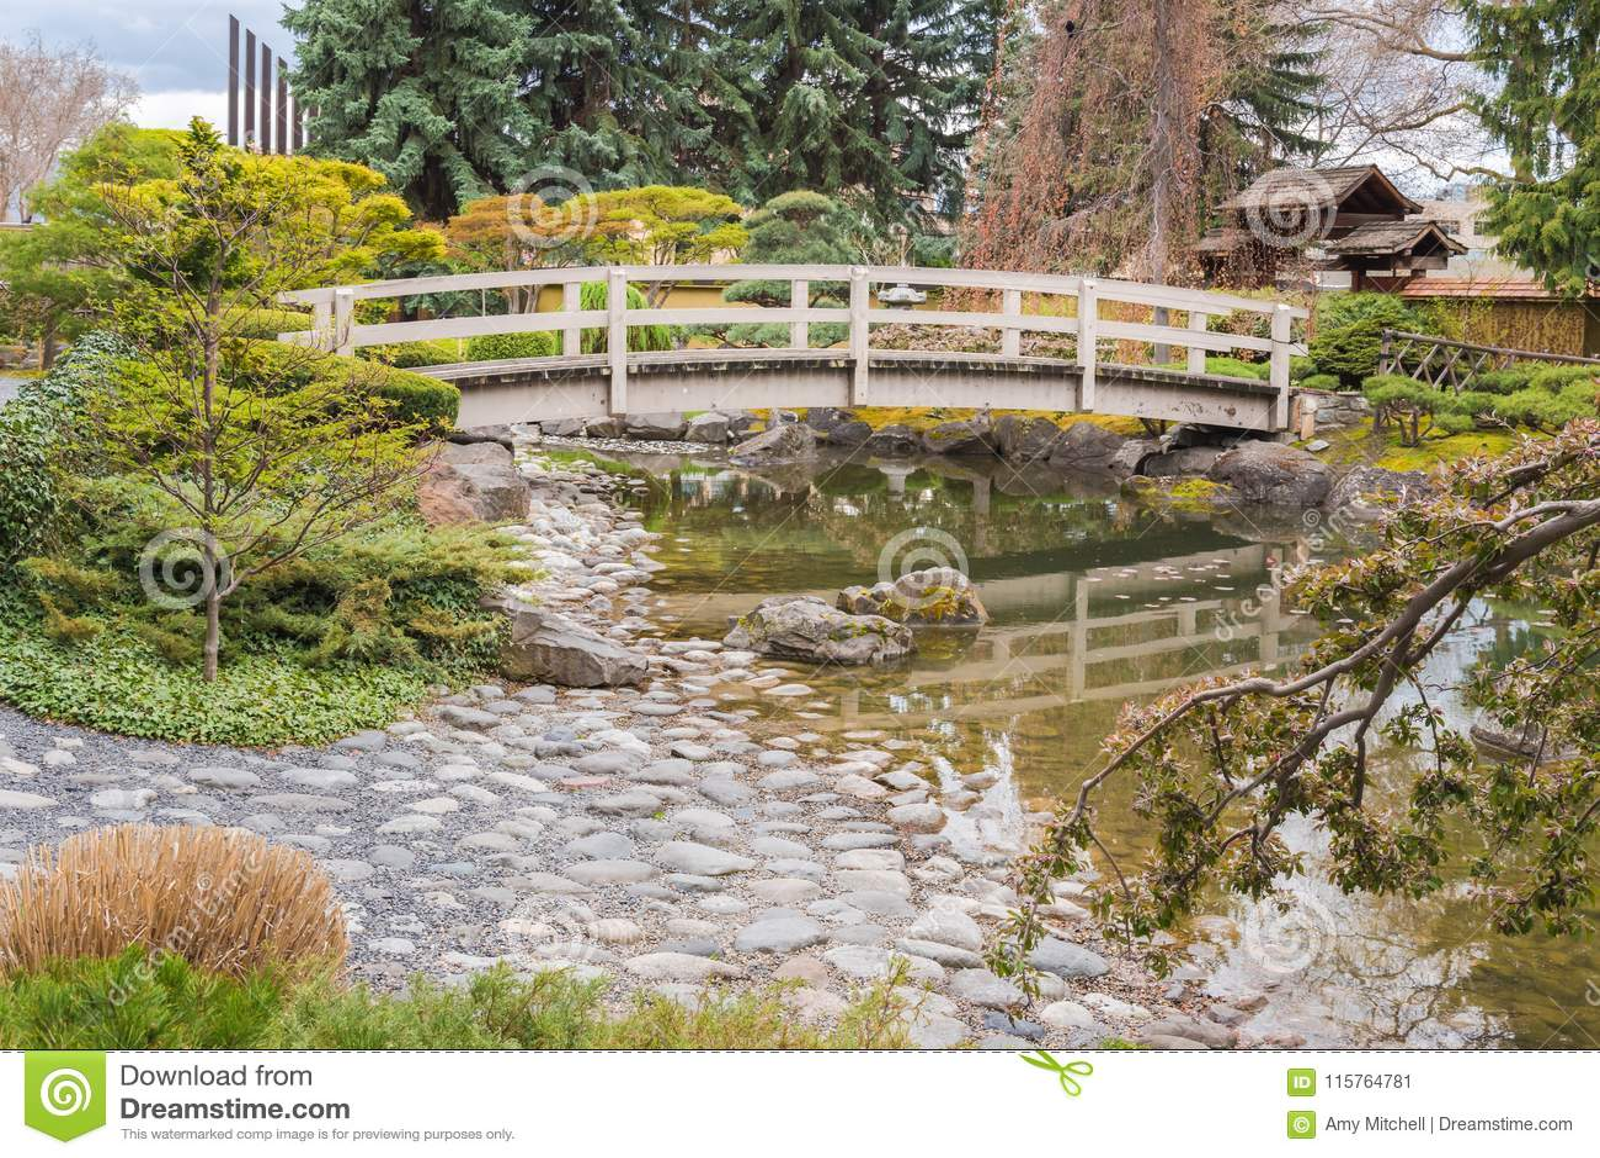 Japanese garden with bridge and koi pond in springtime for Koi pond kelowna